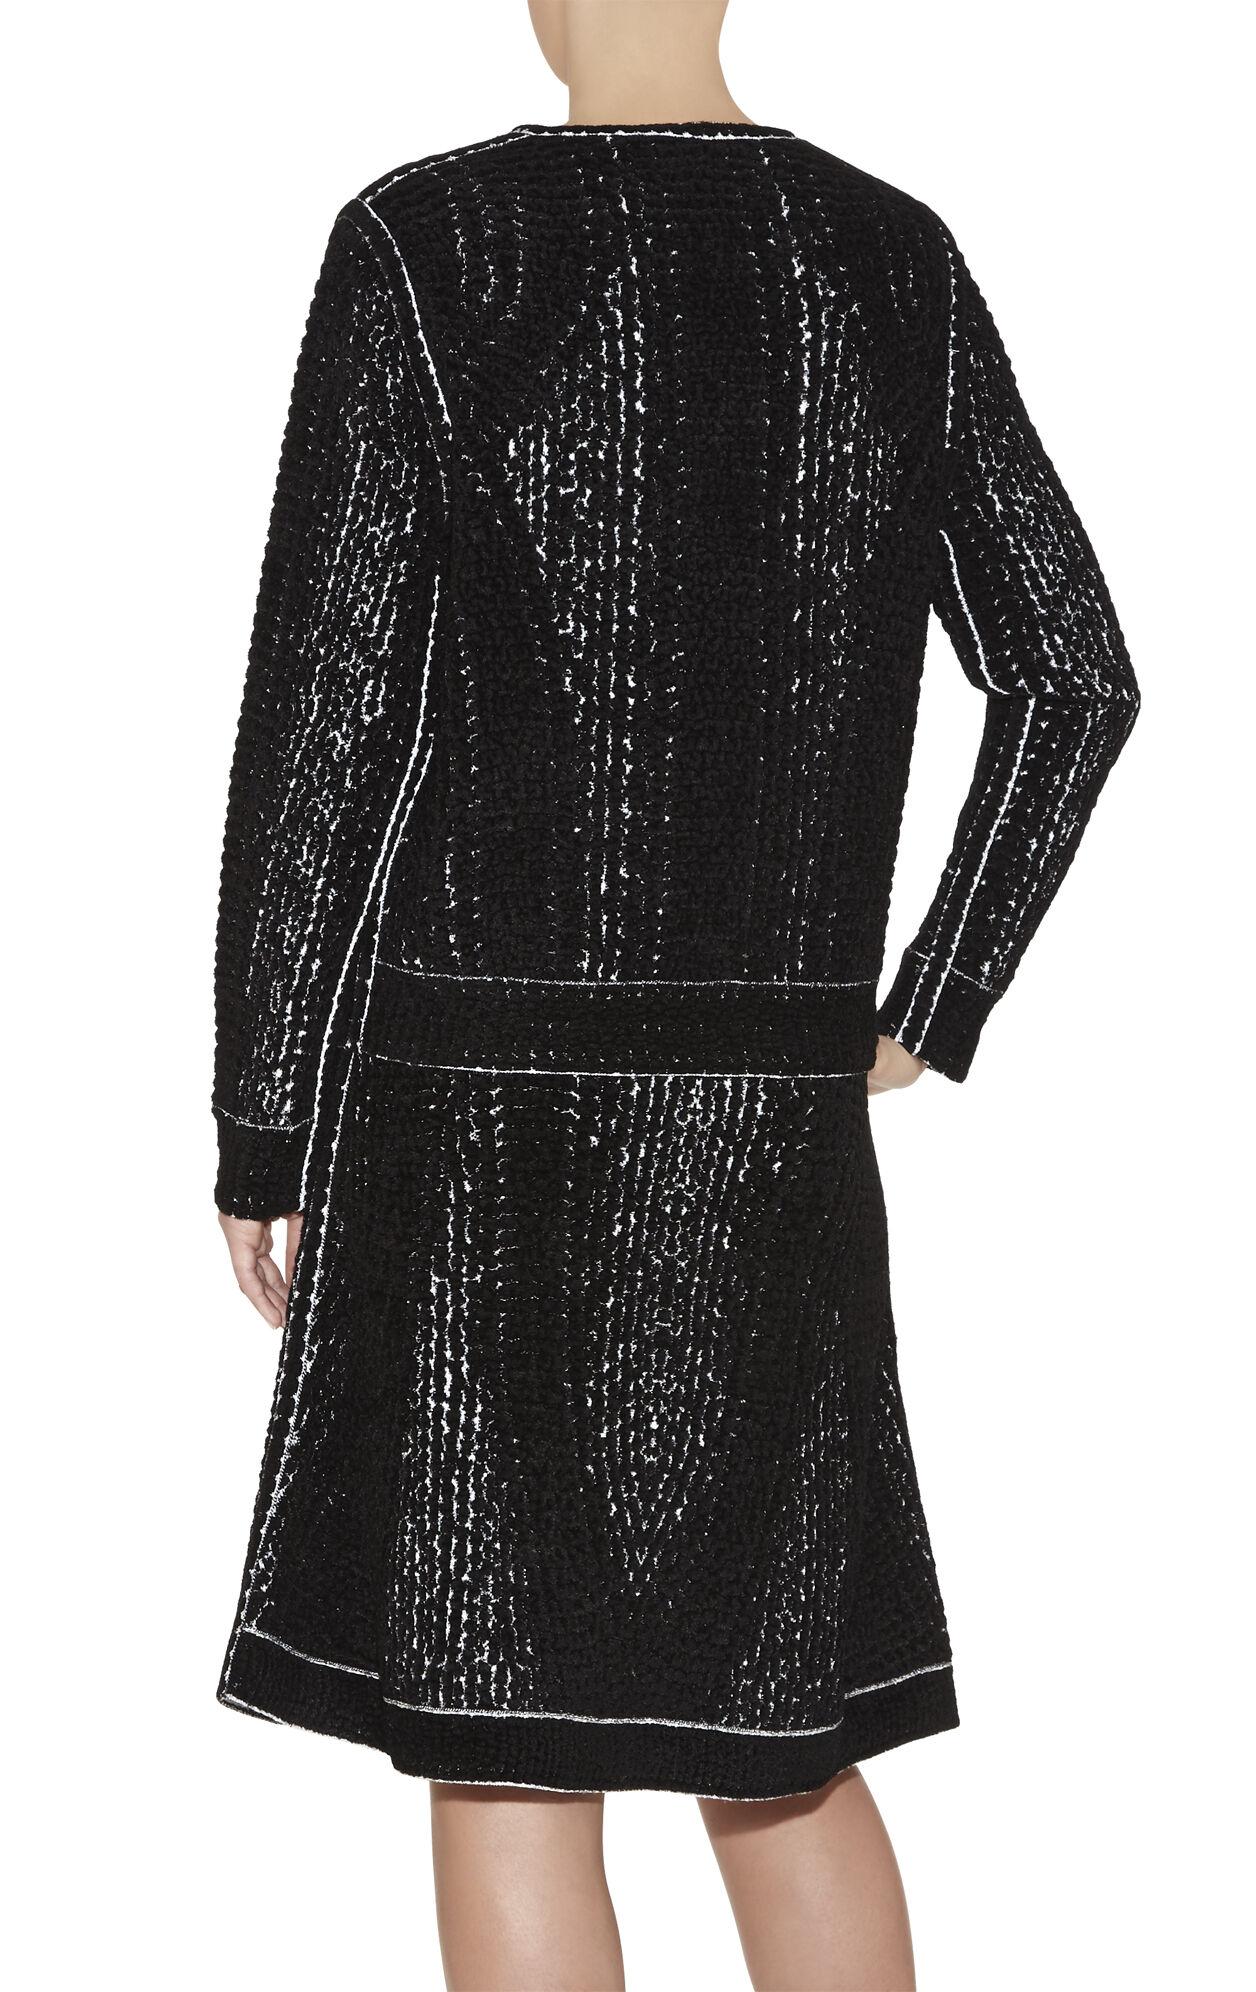 Ronja Chenille Snake Jacquard Sweatshirt